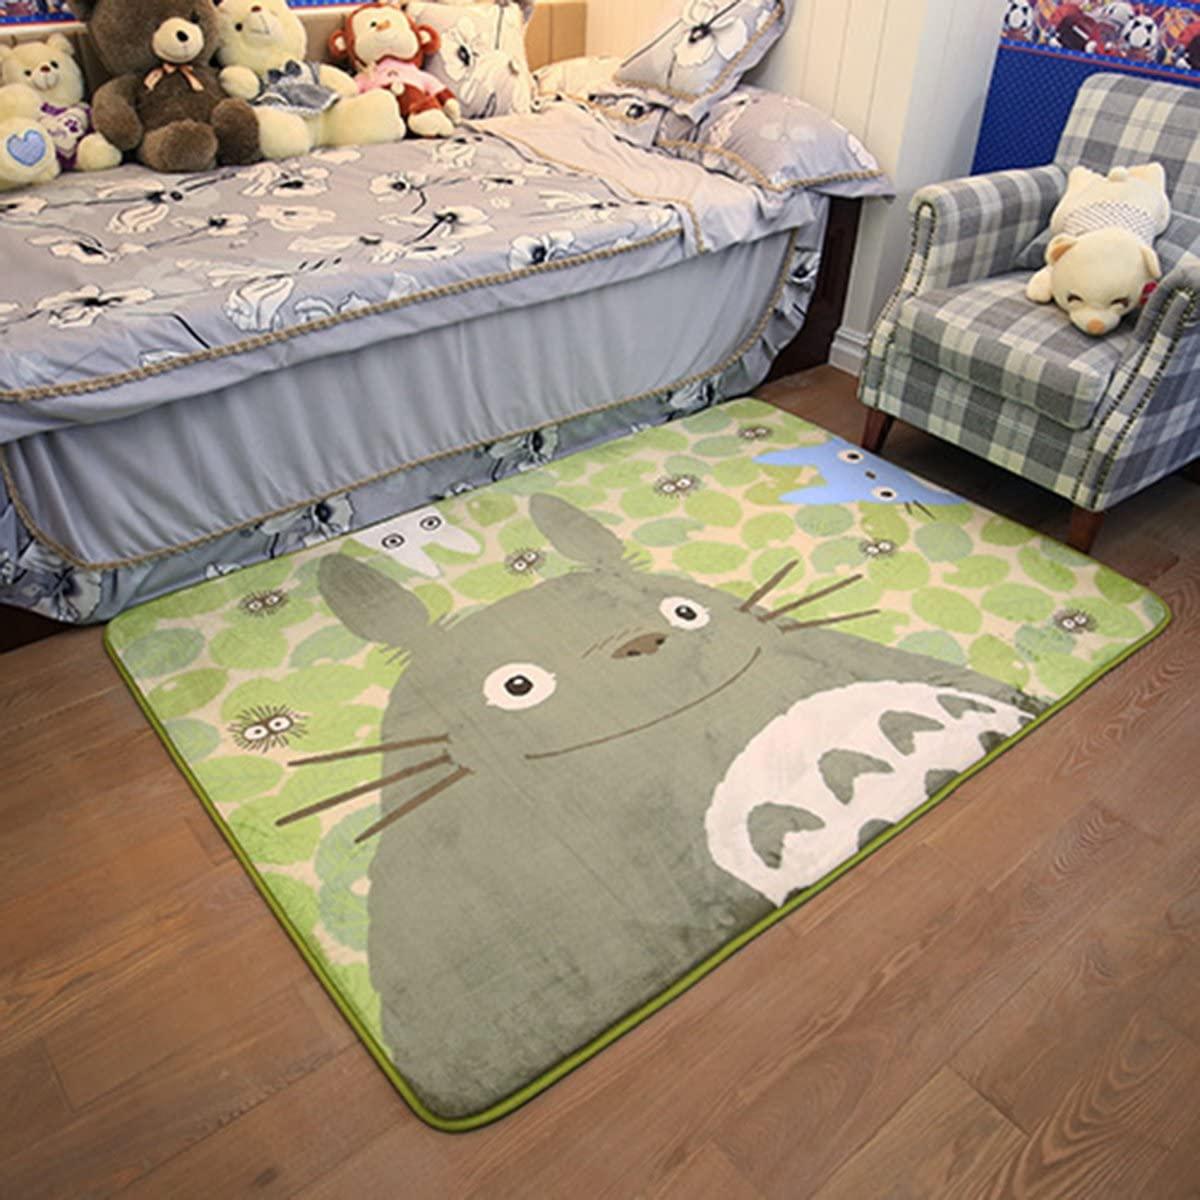 EKEA-Home Cartoon TOTORO Skid-proof Washable Big Carpet Kids Nursery Entertainment Floor Area Rugs Baby Crawling Mat For Living Room/Bed Room Green,50x120cm/19.7